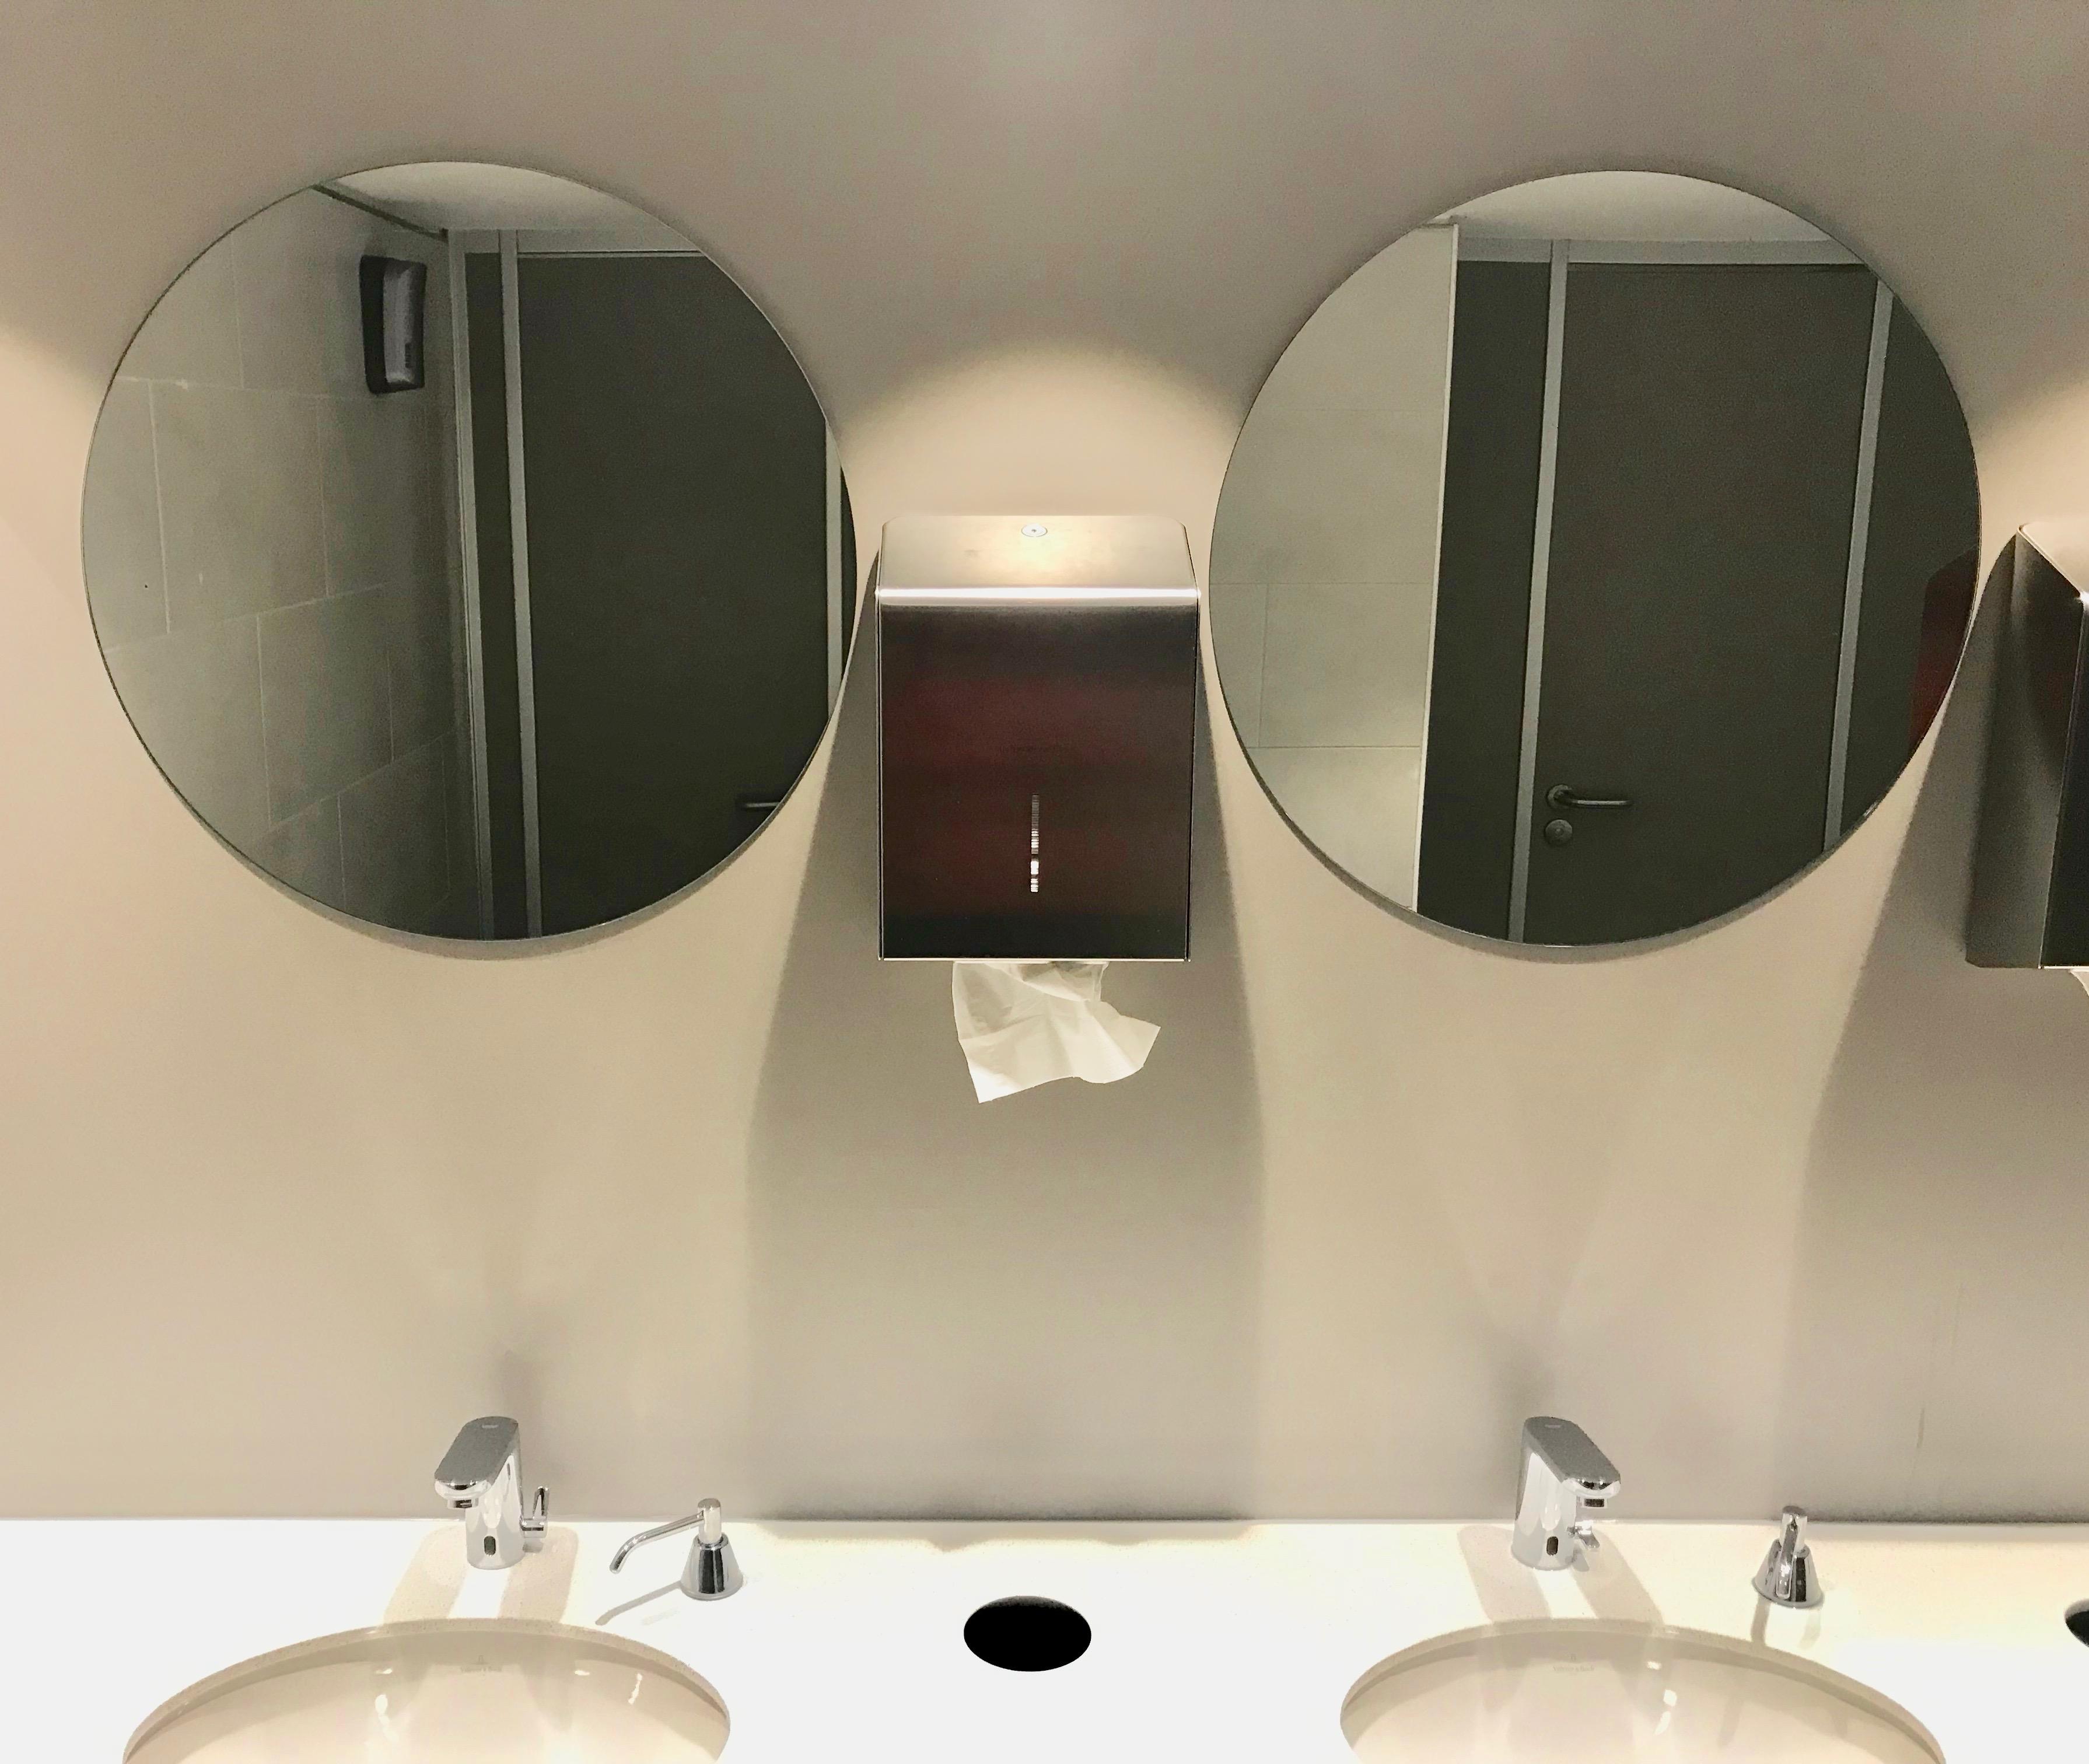 Toletto toiletten Marriott hotel Amsterdam 2